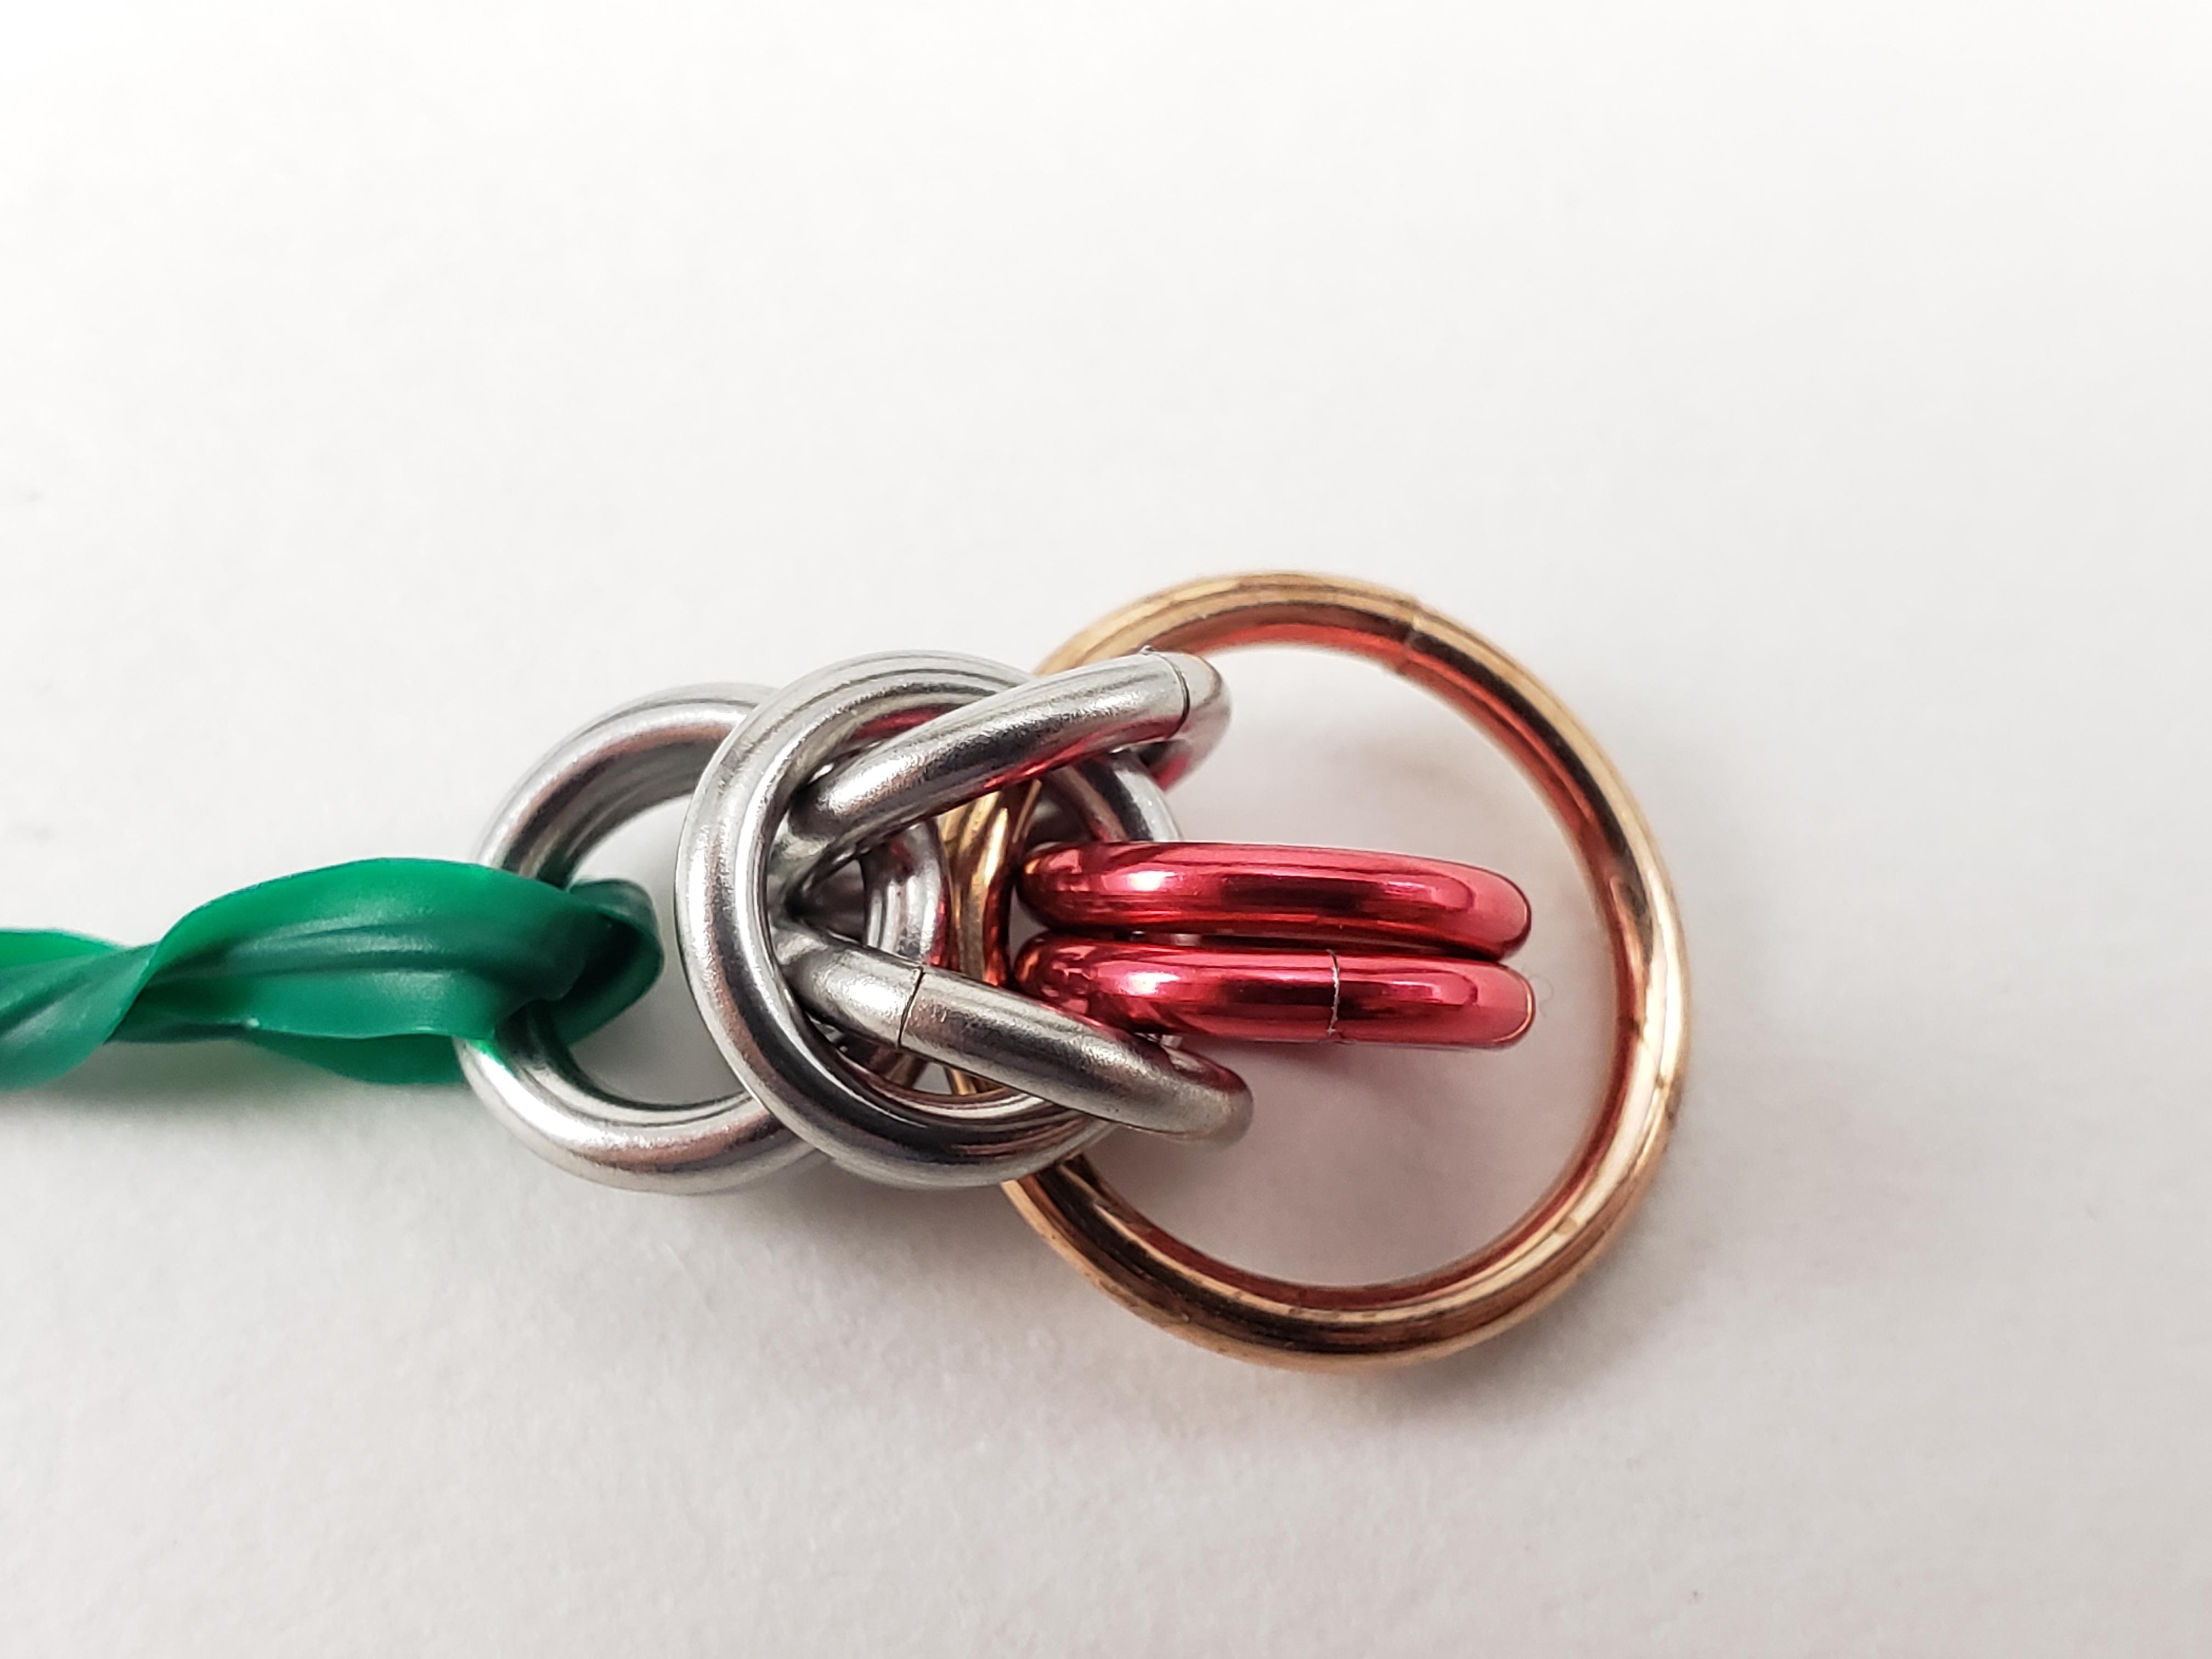 Double locked byz image 4.jpg